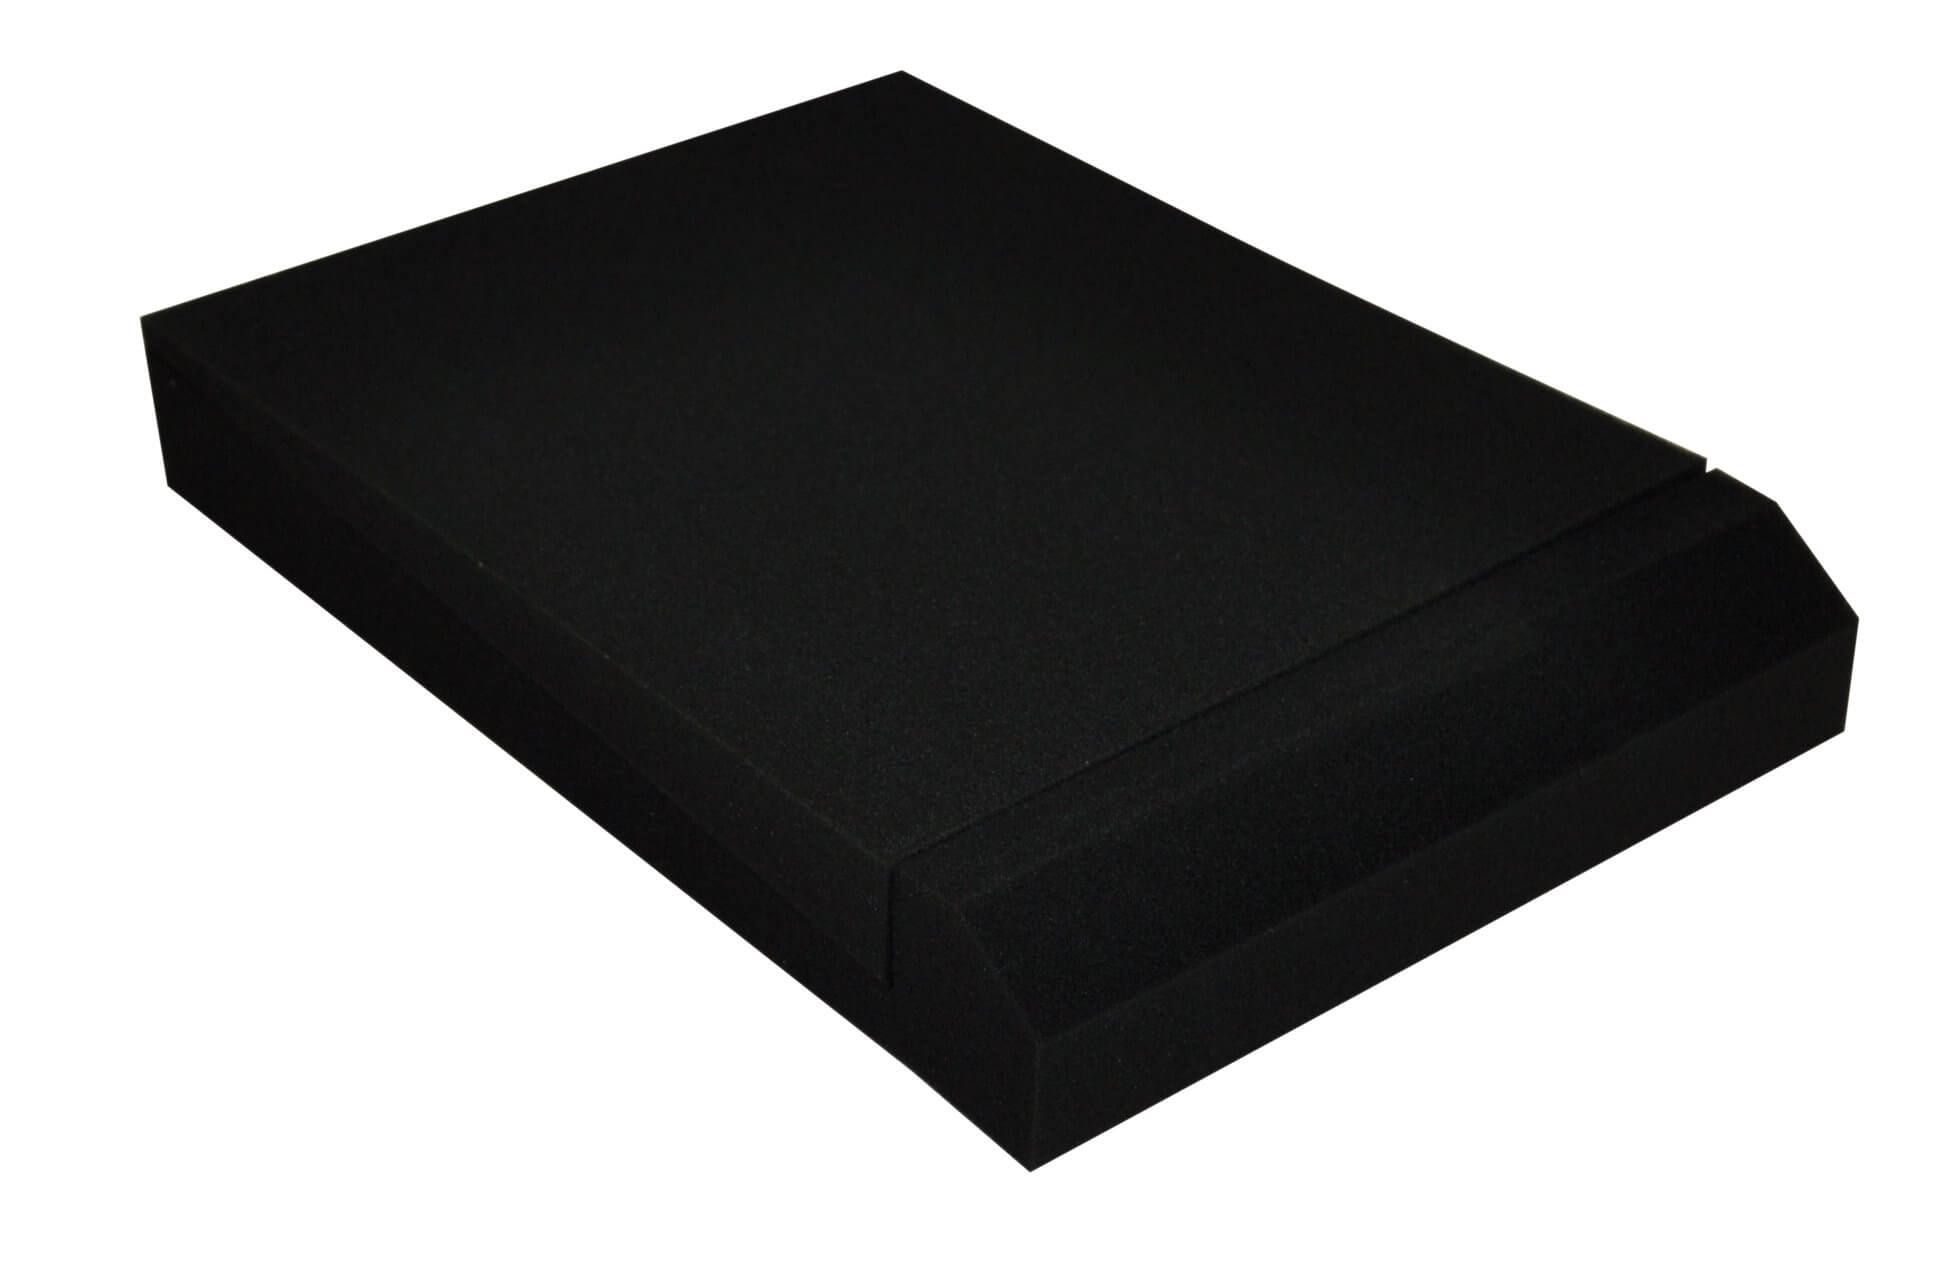 NJS Acoustic Isolation Monitor Speaker Pad Medium